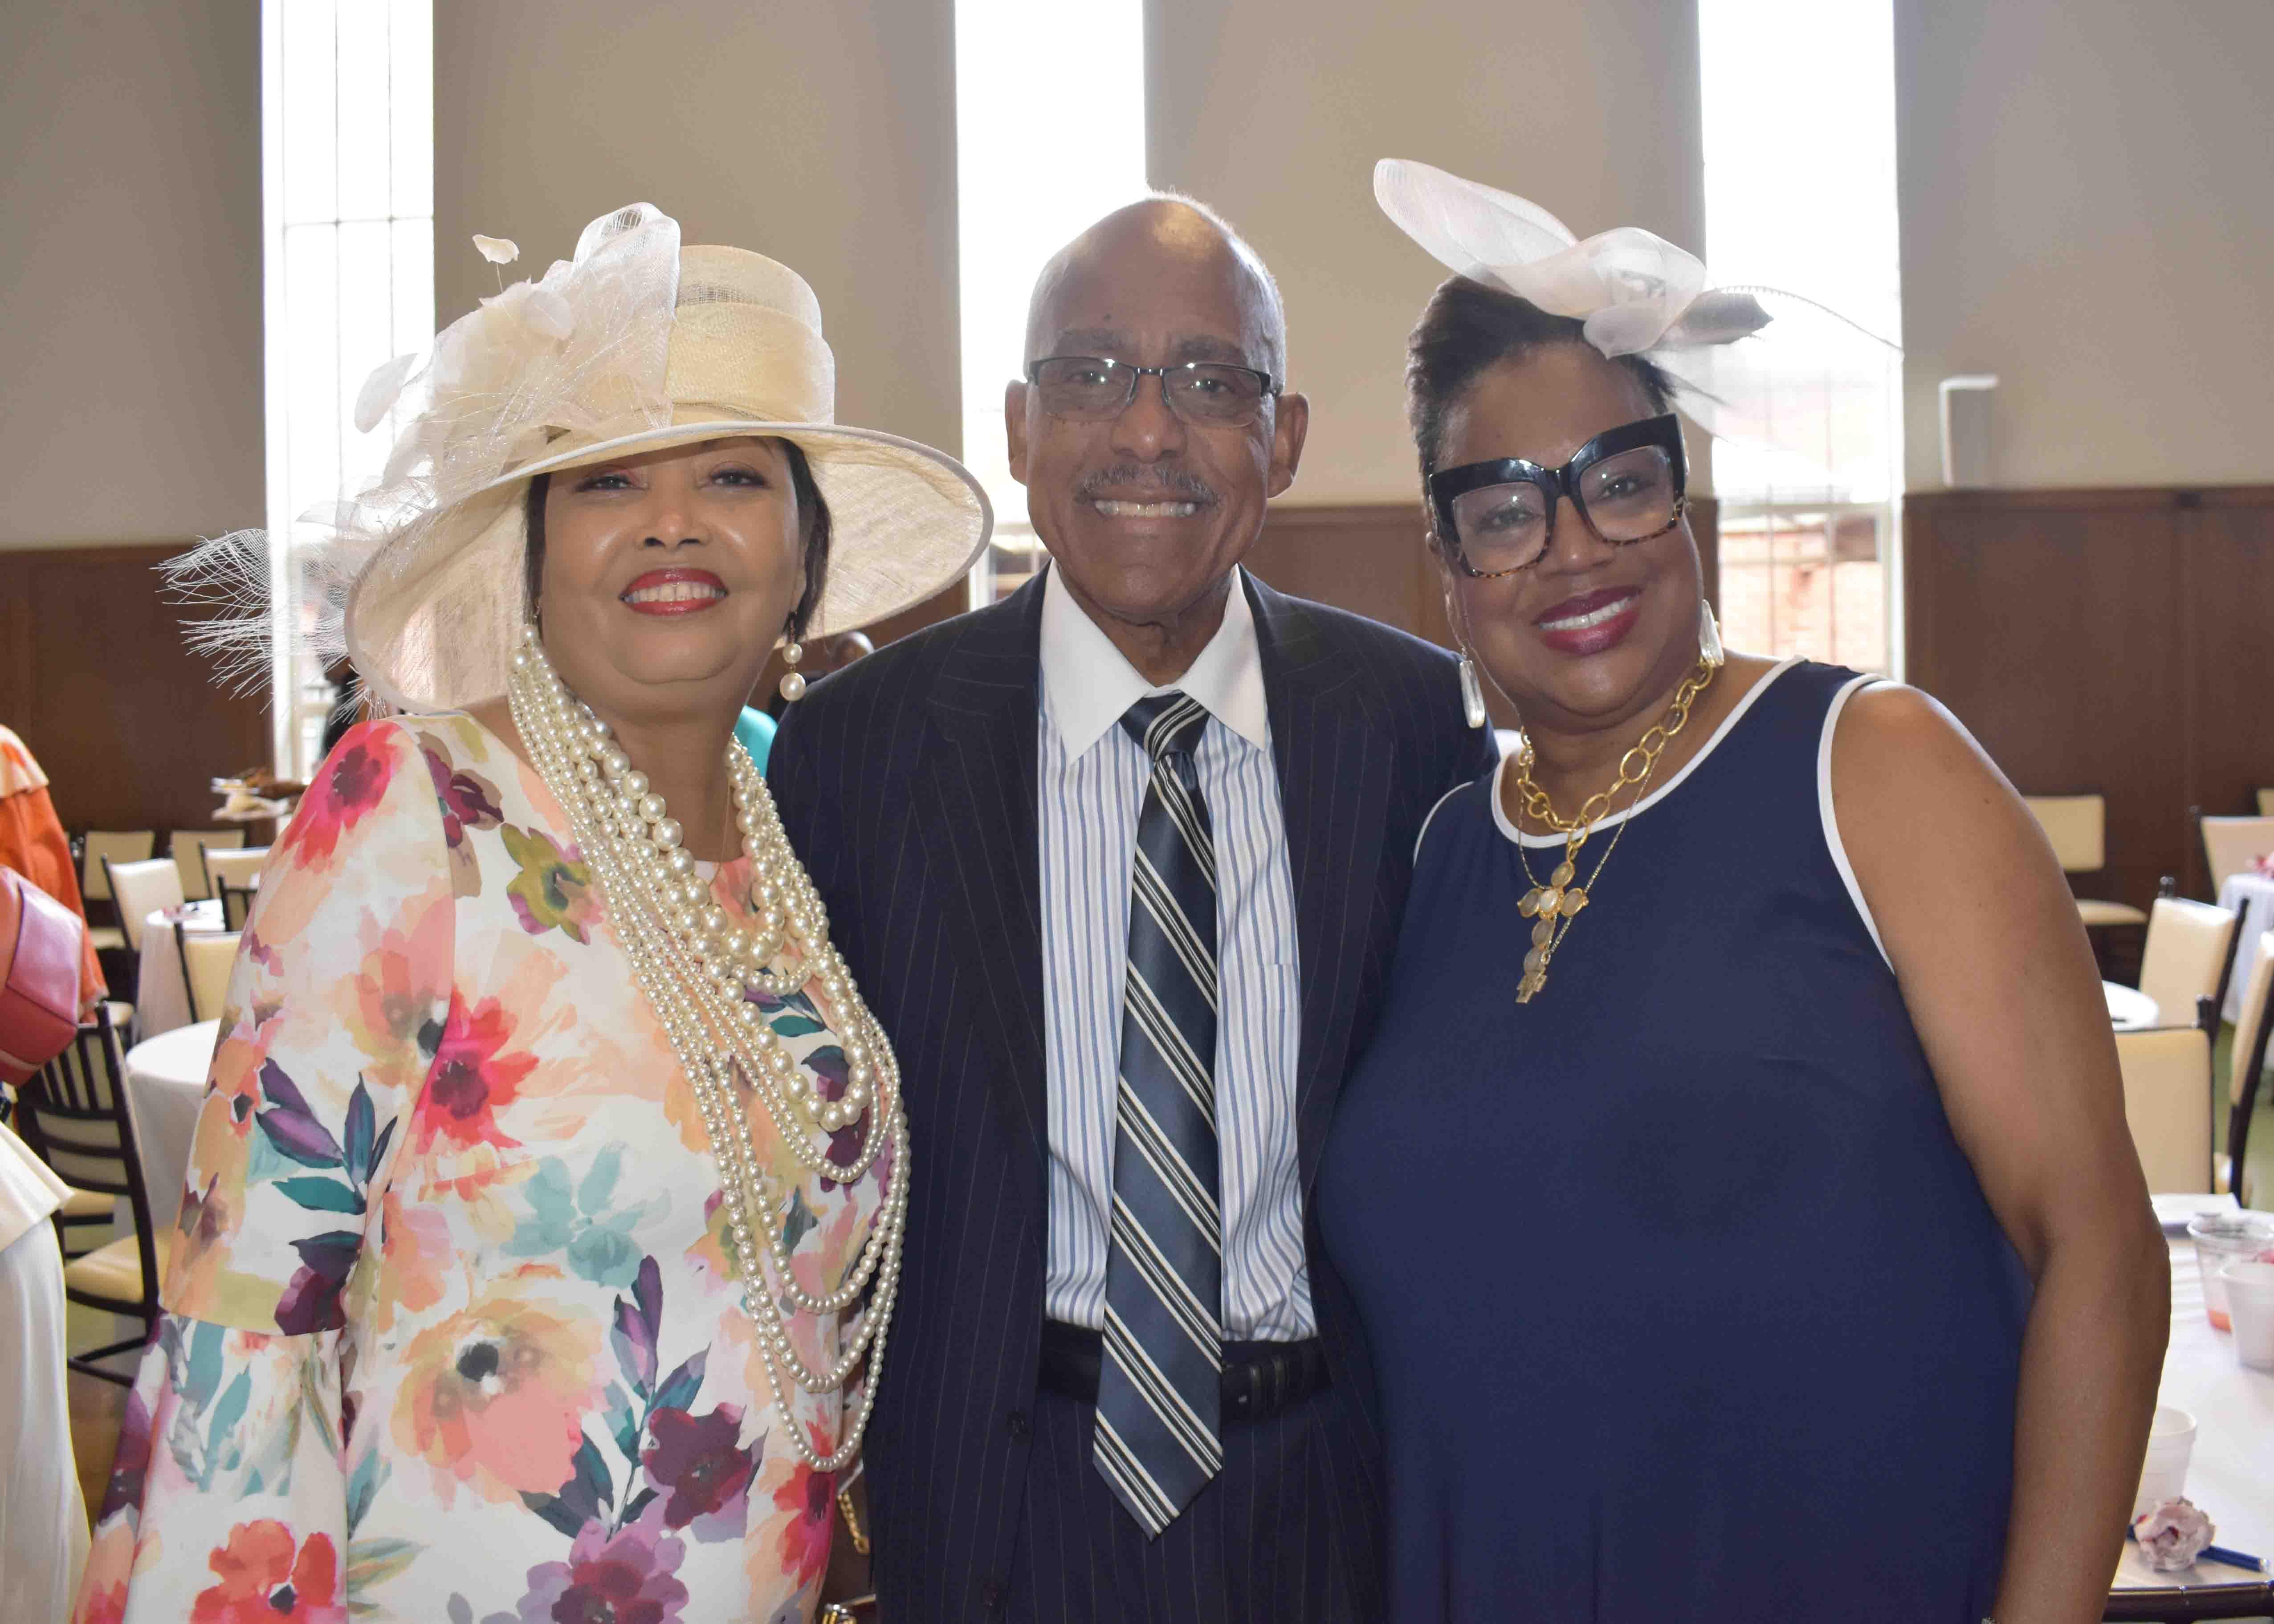 Sheila Washington, Revs. Truman & Bettie Tolefree